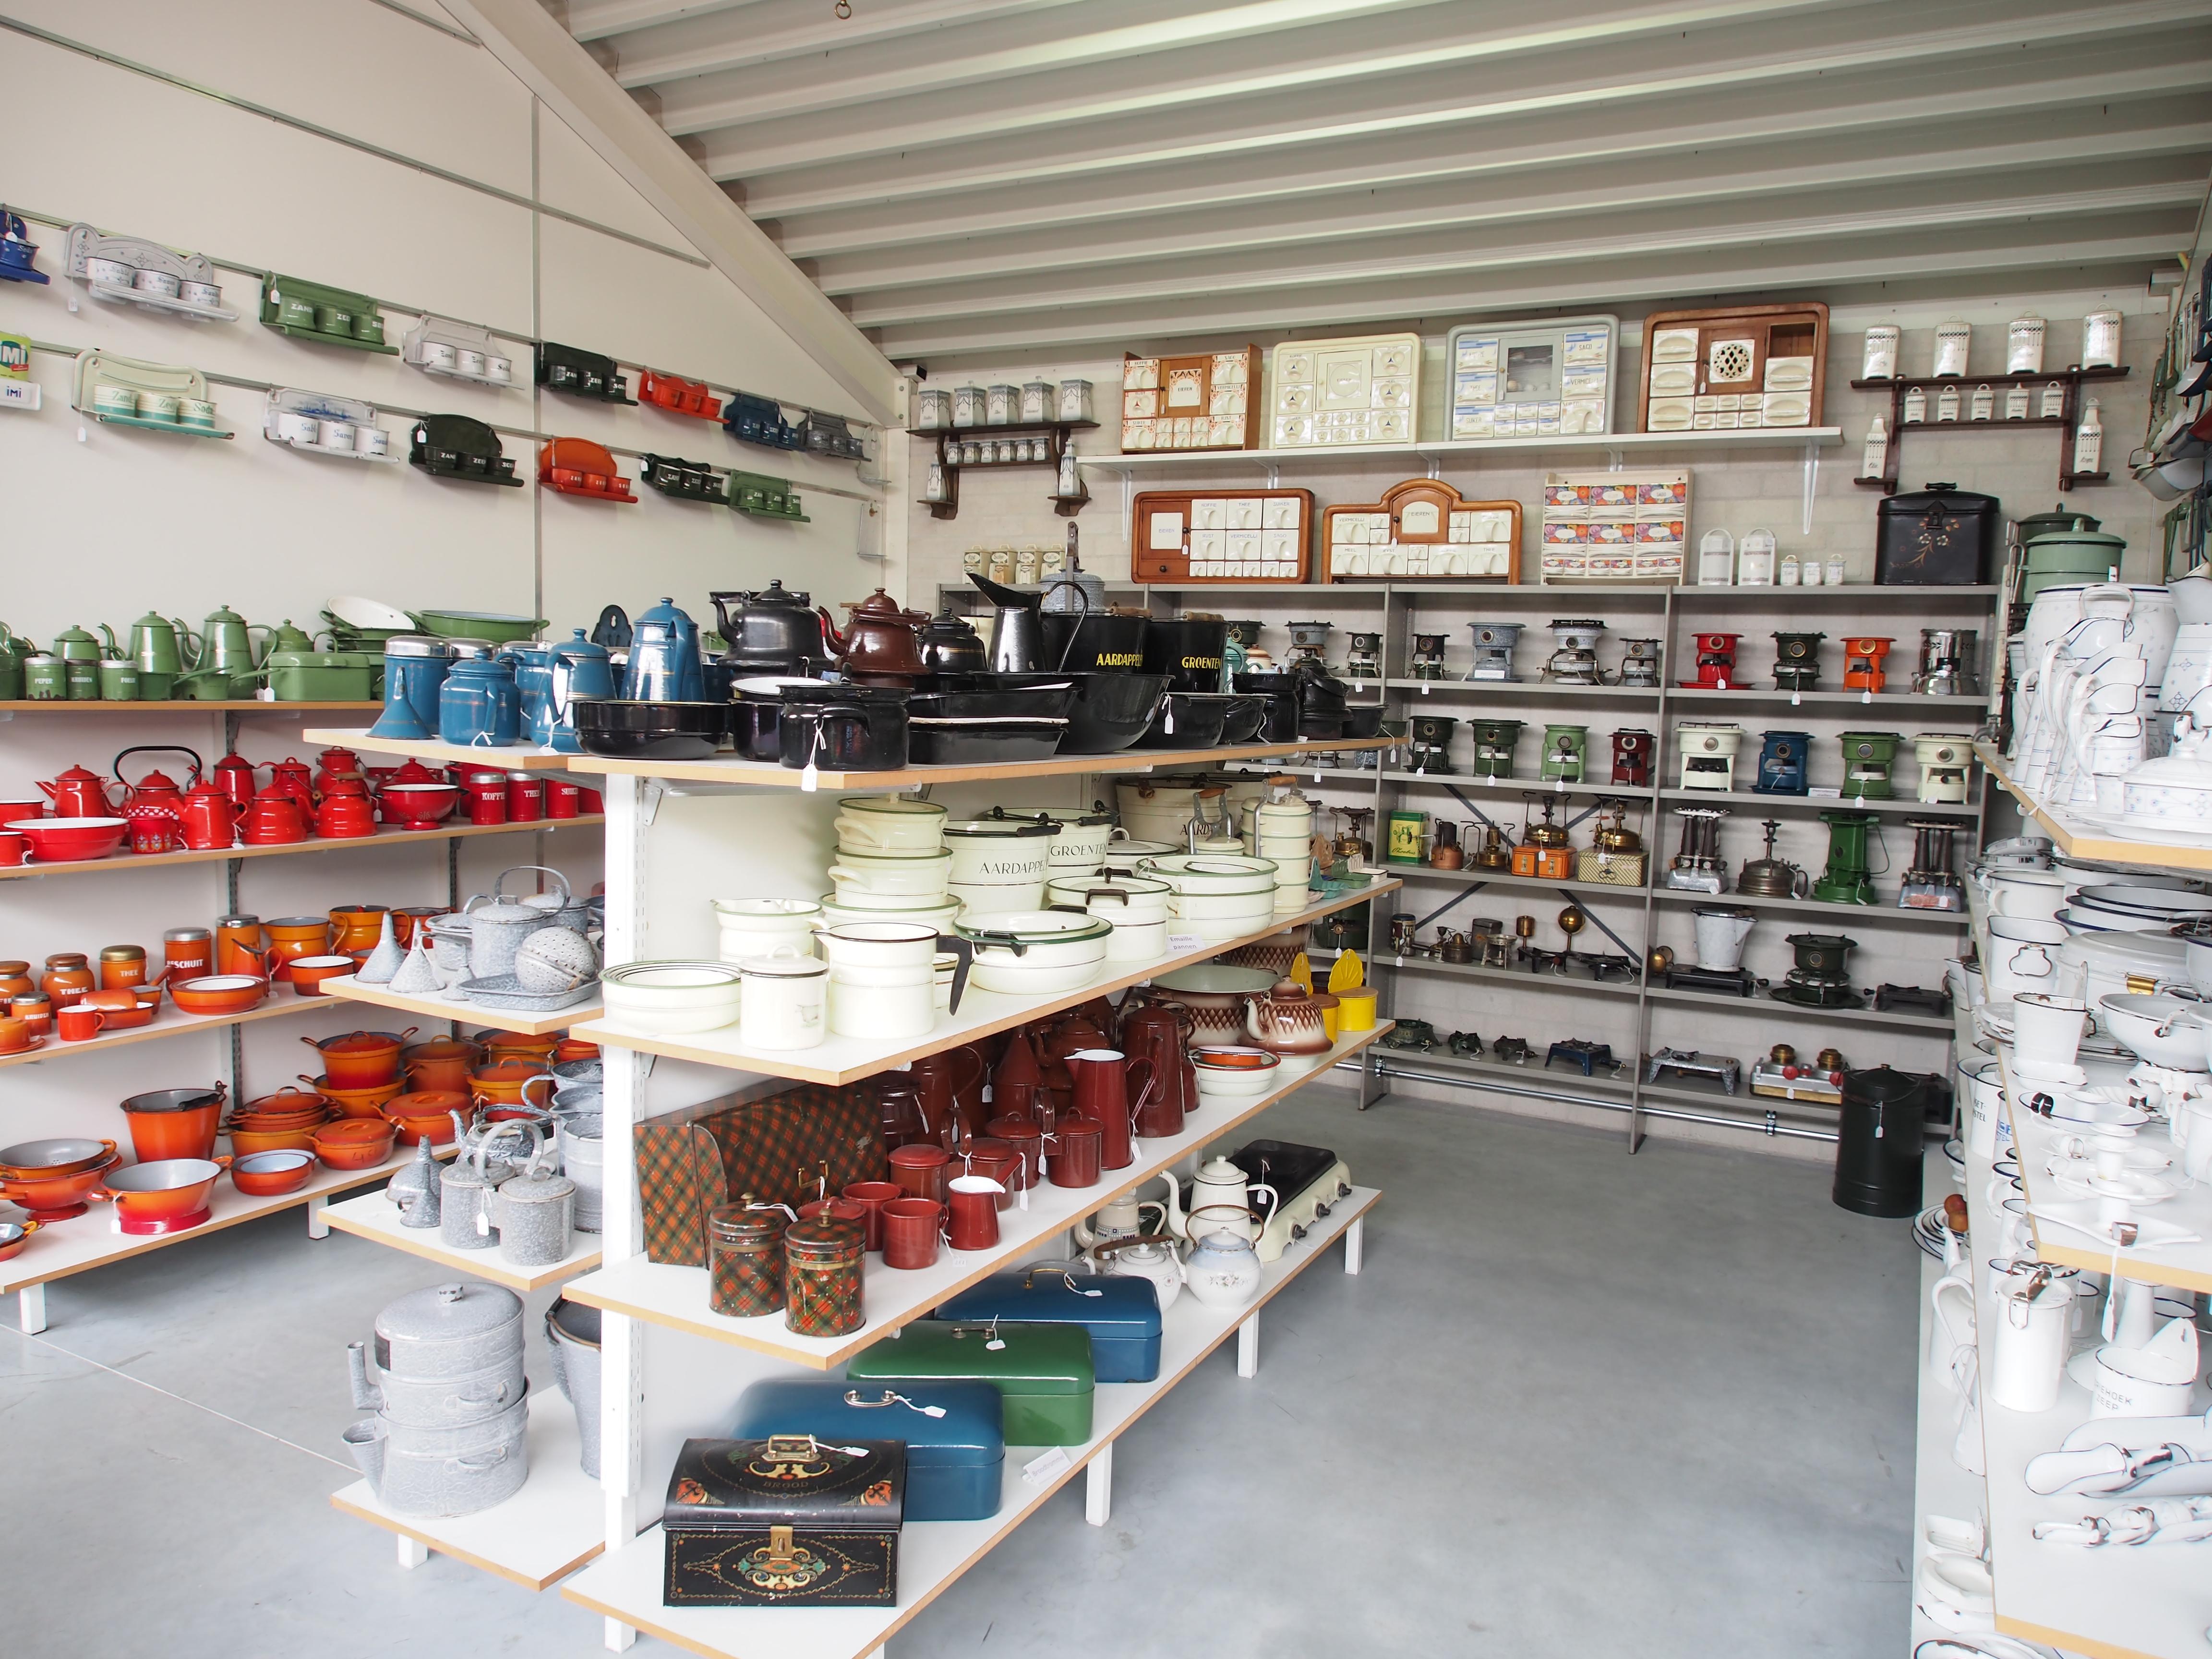 Keuken Outlet Store : File:keukengerij museum voor nostalgie en techniek pic2.jpg